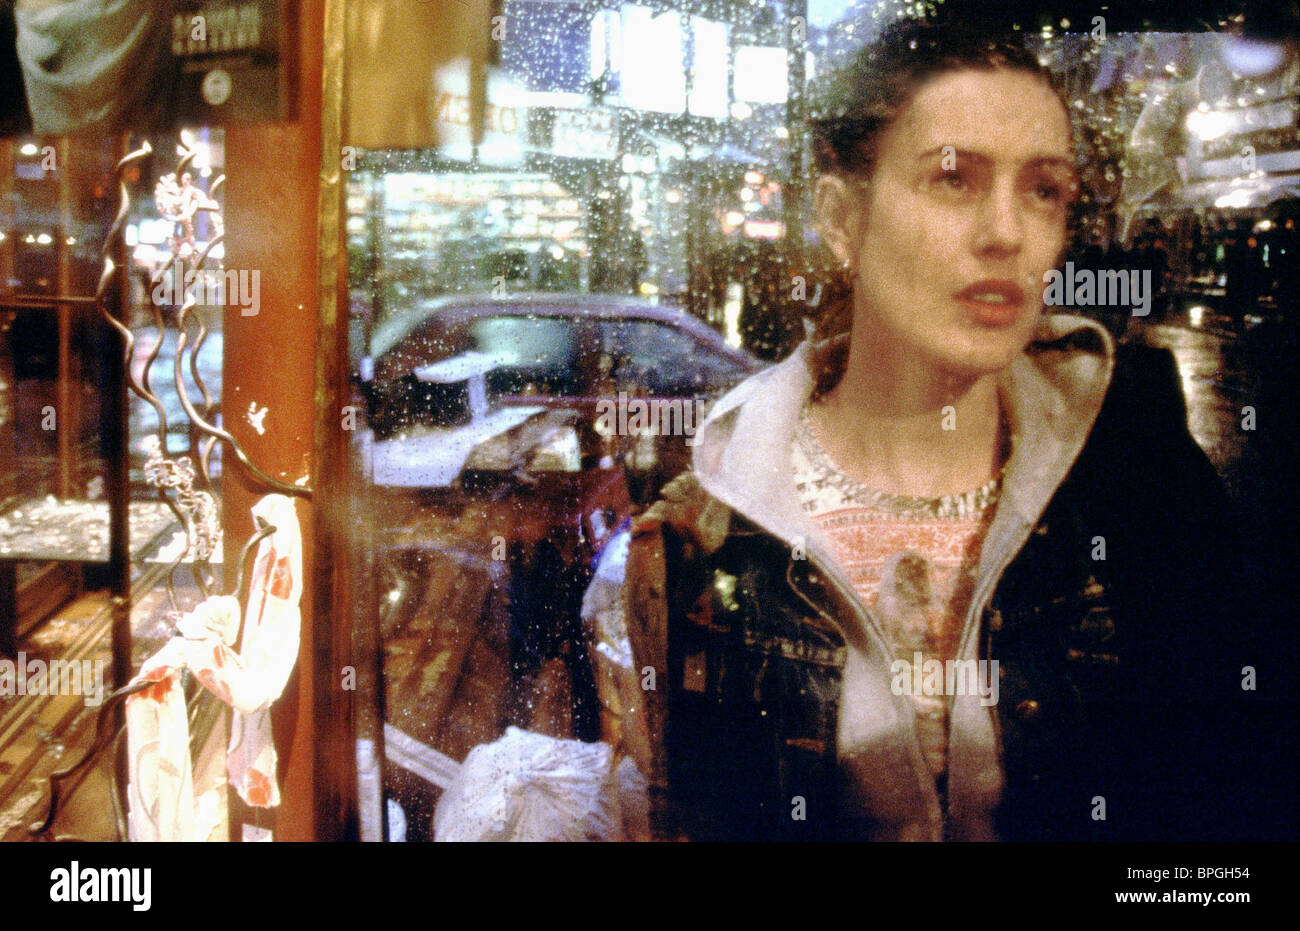 GINA MCKEE WONDERLAND (1999) - Stock Image